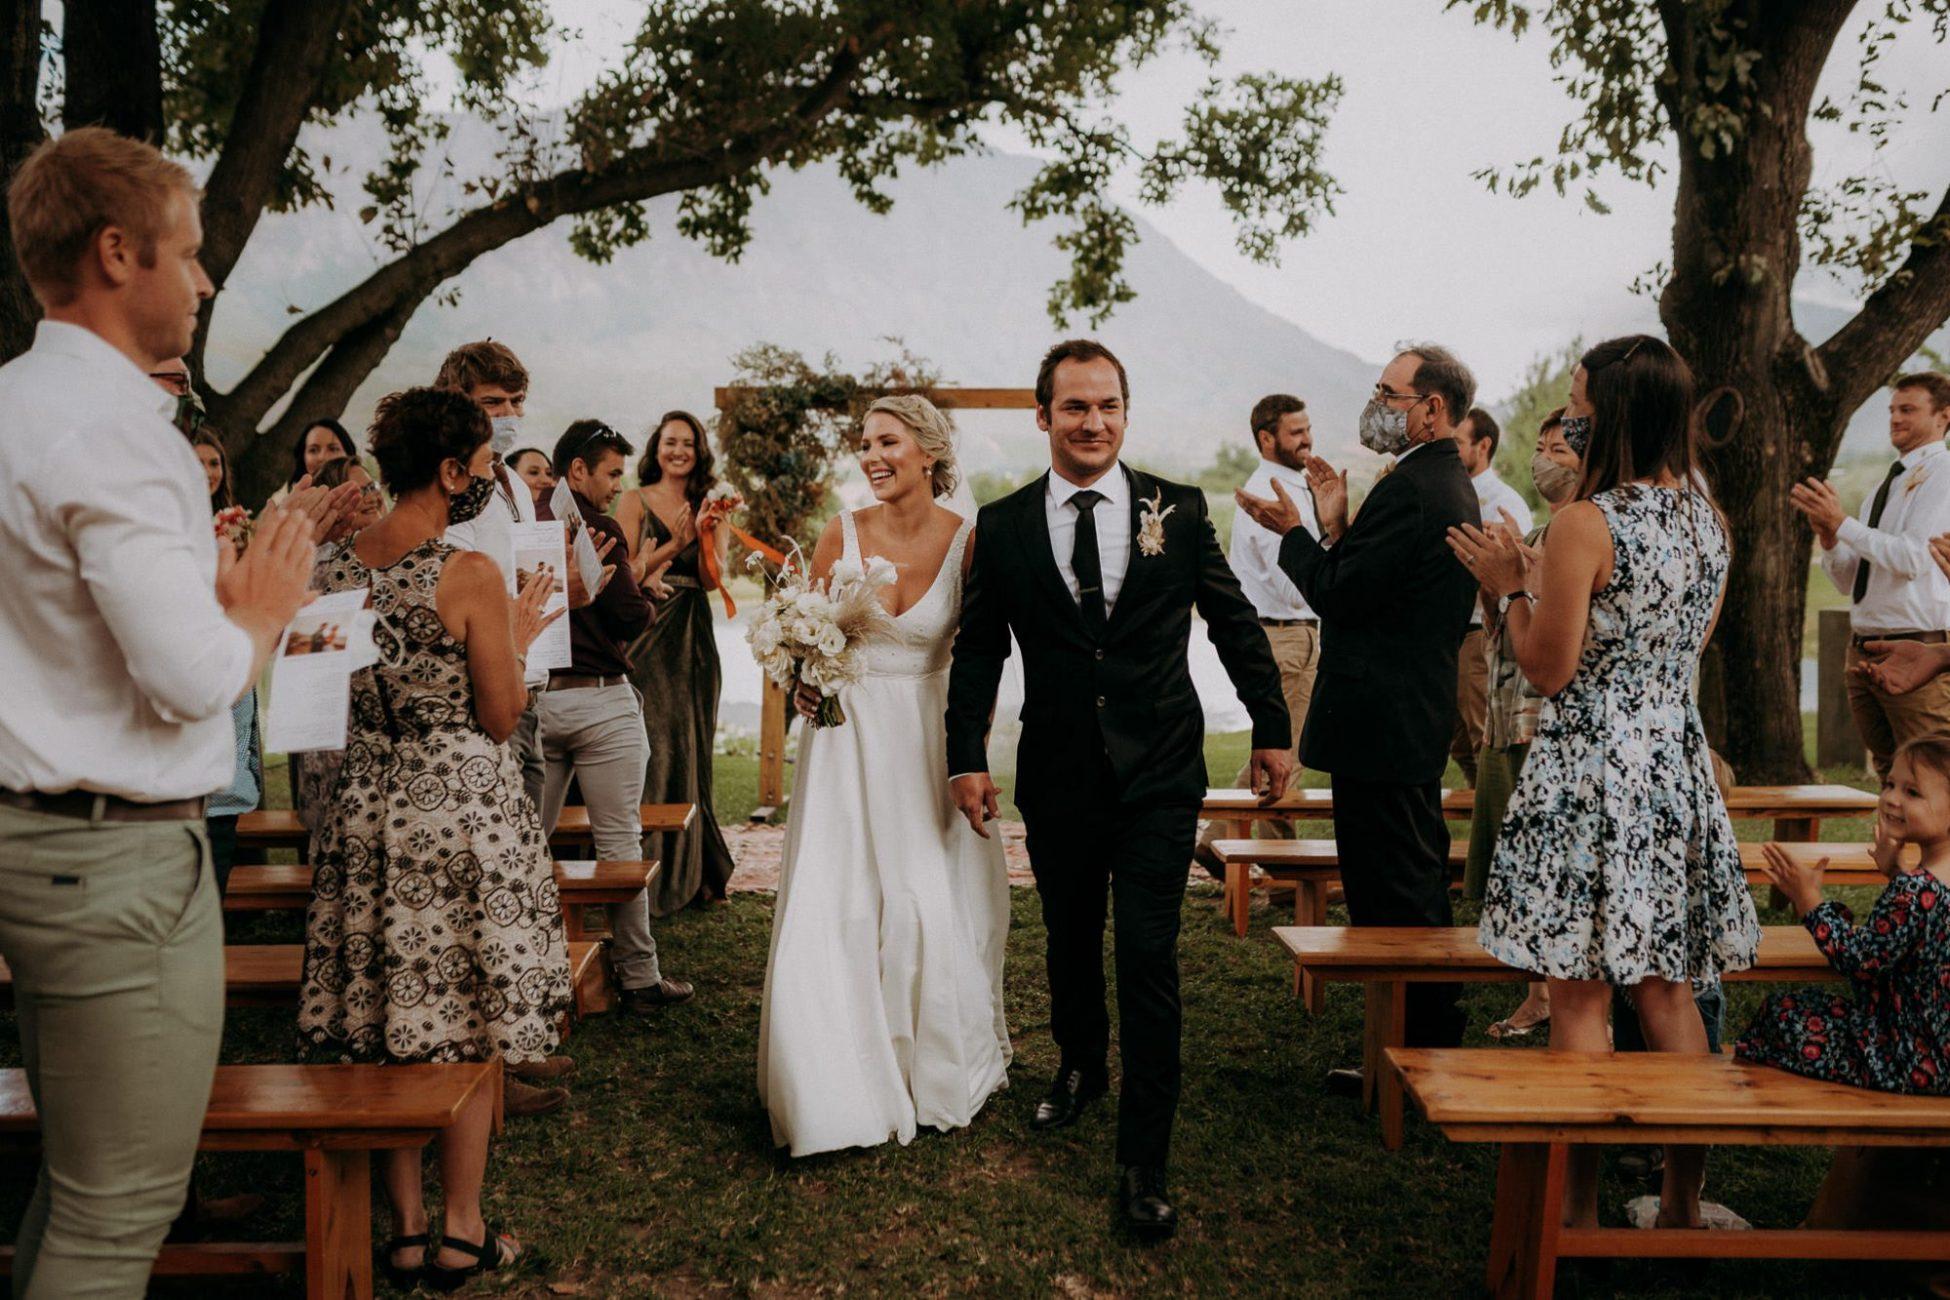 cr8tiveduo-weddingphotographer-destinationphotographer-weddingvideographer-boho-rustic